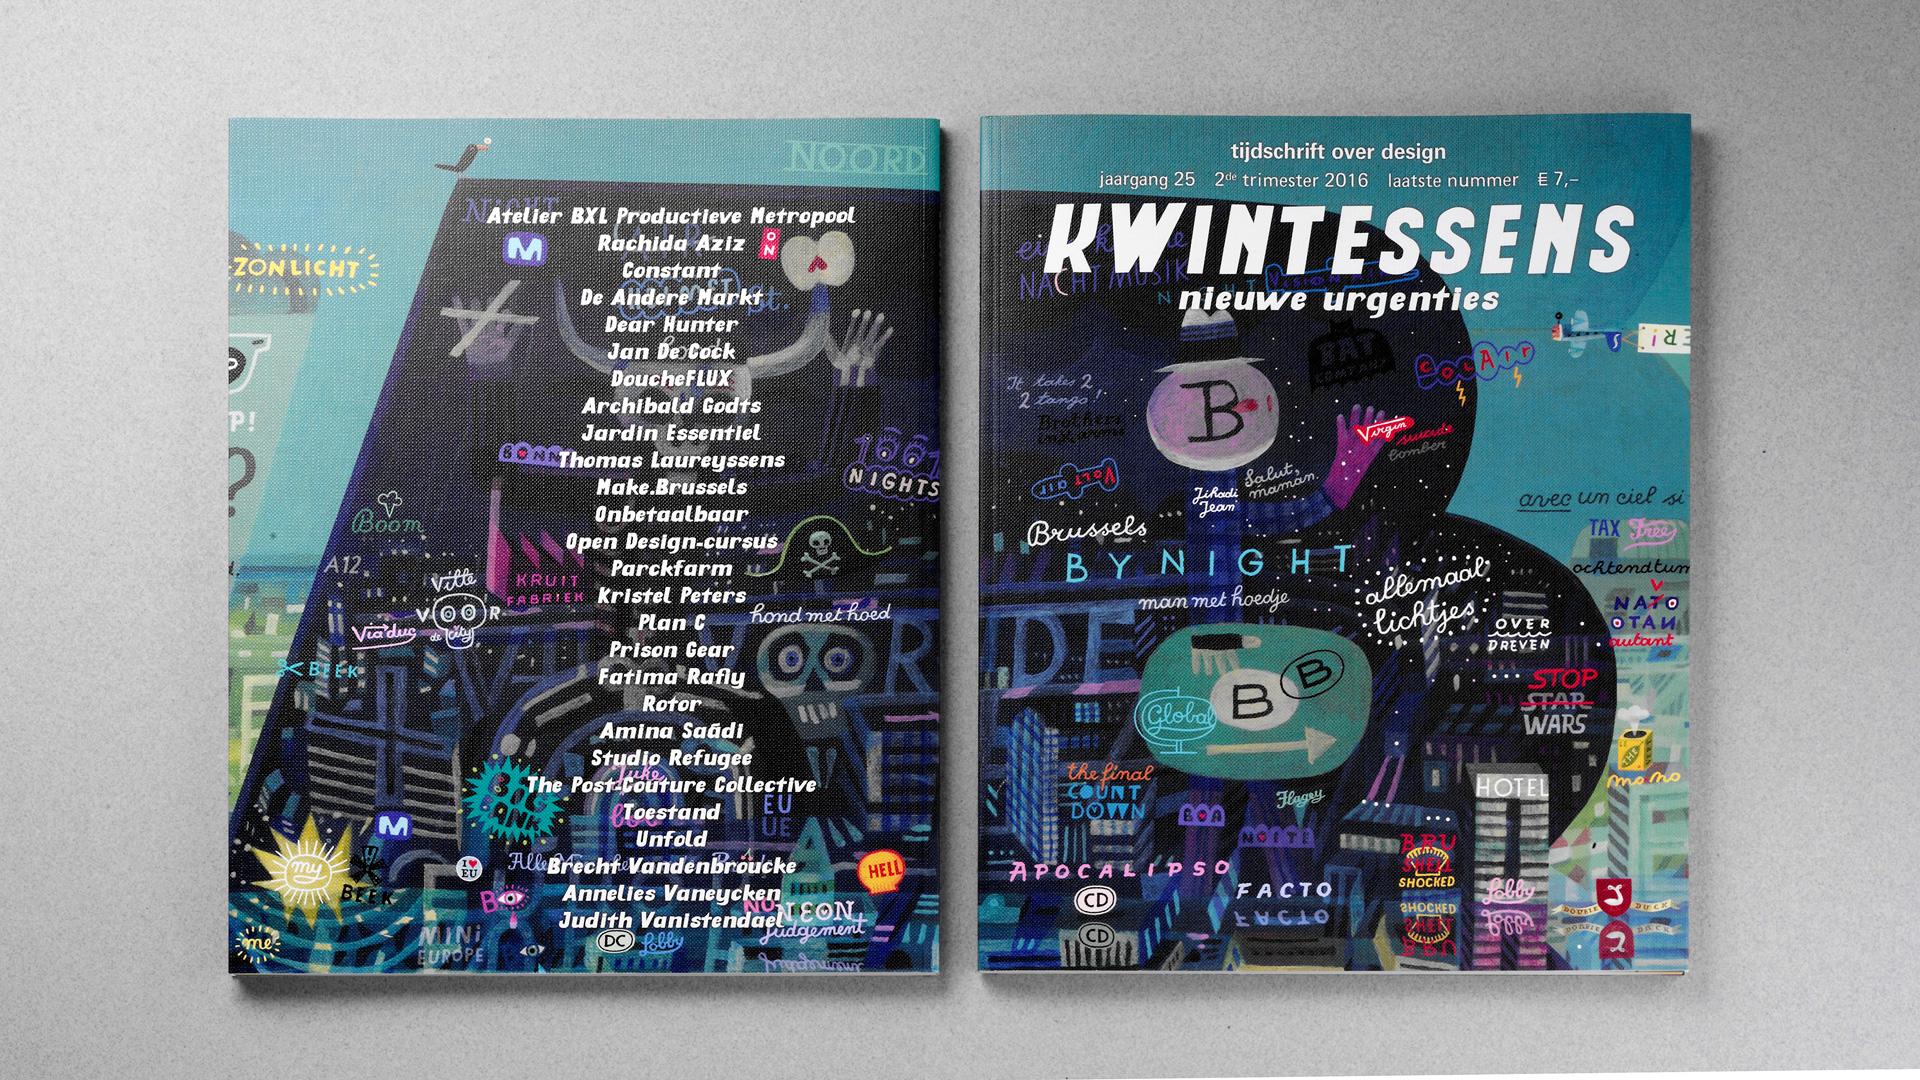 Kwintessens-Pagina-COVERS.jpg